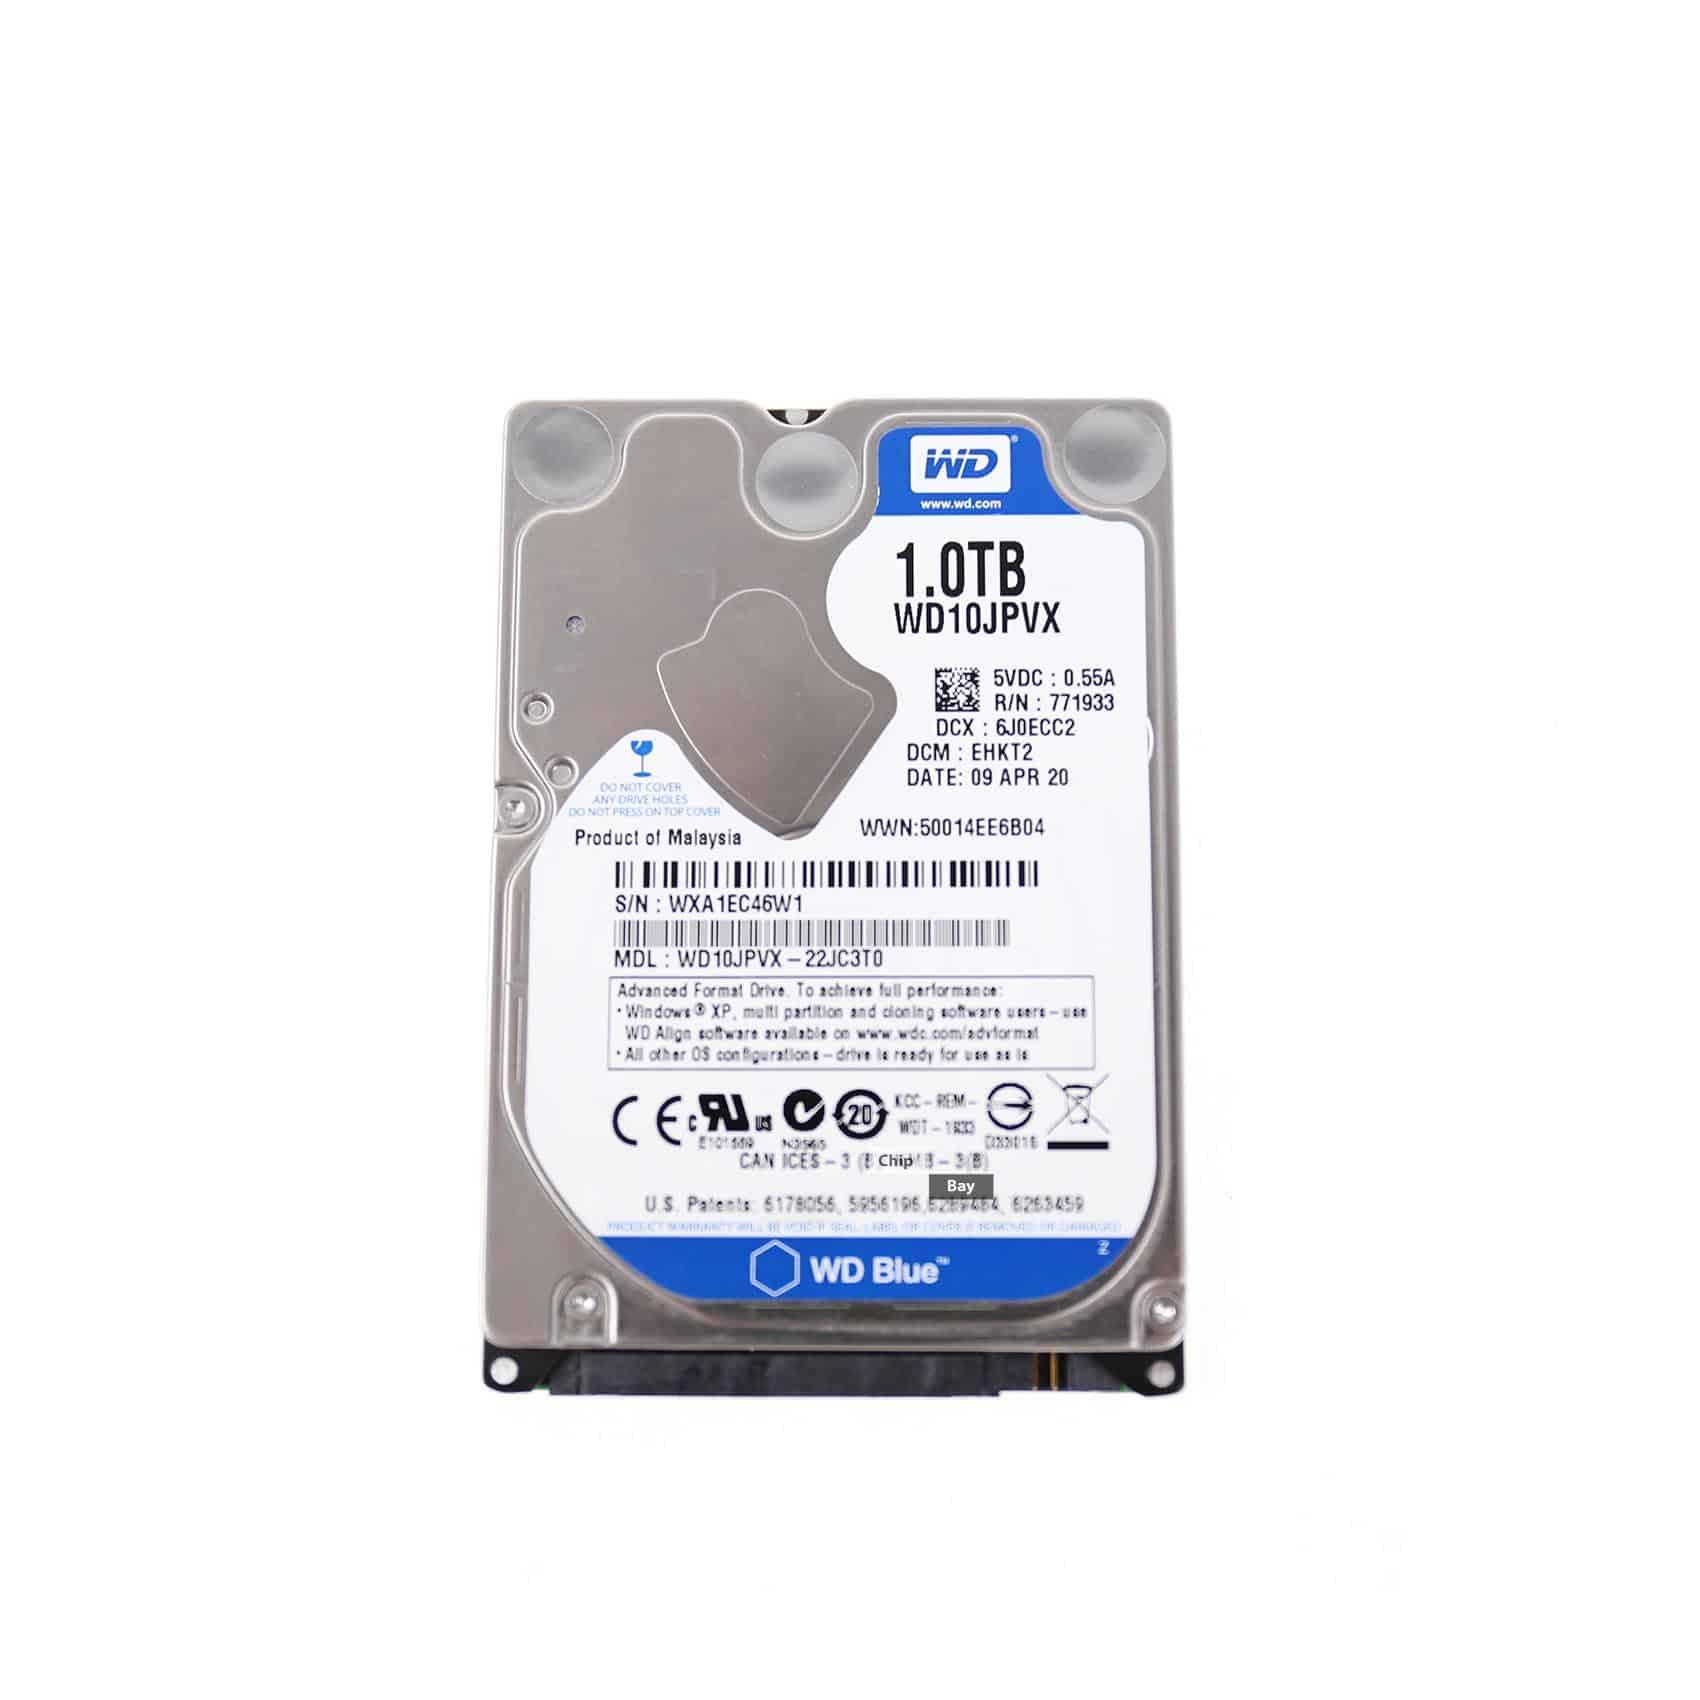 Genuine Wd Blue 1tb Laptop Ps3 Hard Drive Hdd 25 Sata Iii Wd10jpvx Harddisk Wb Hardisk Chipbay